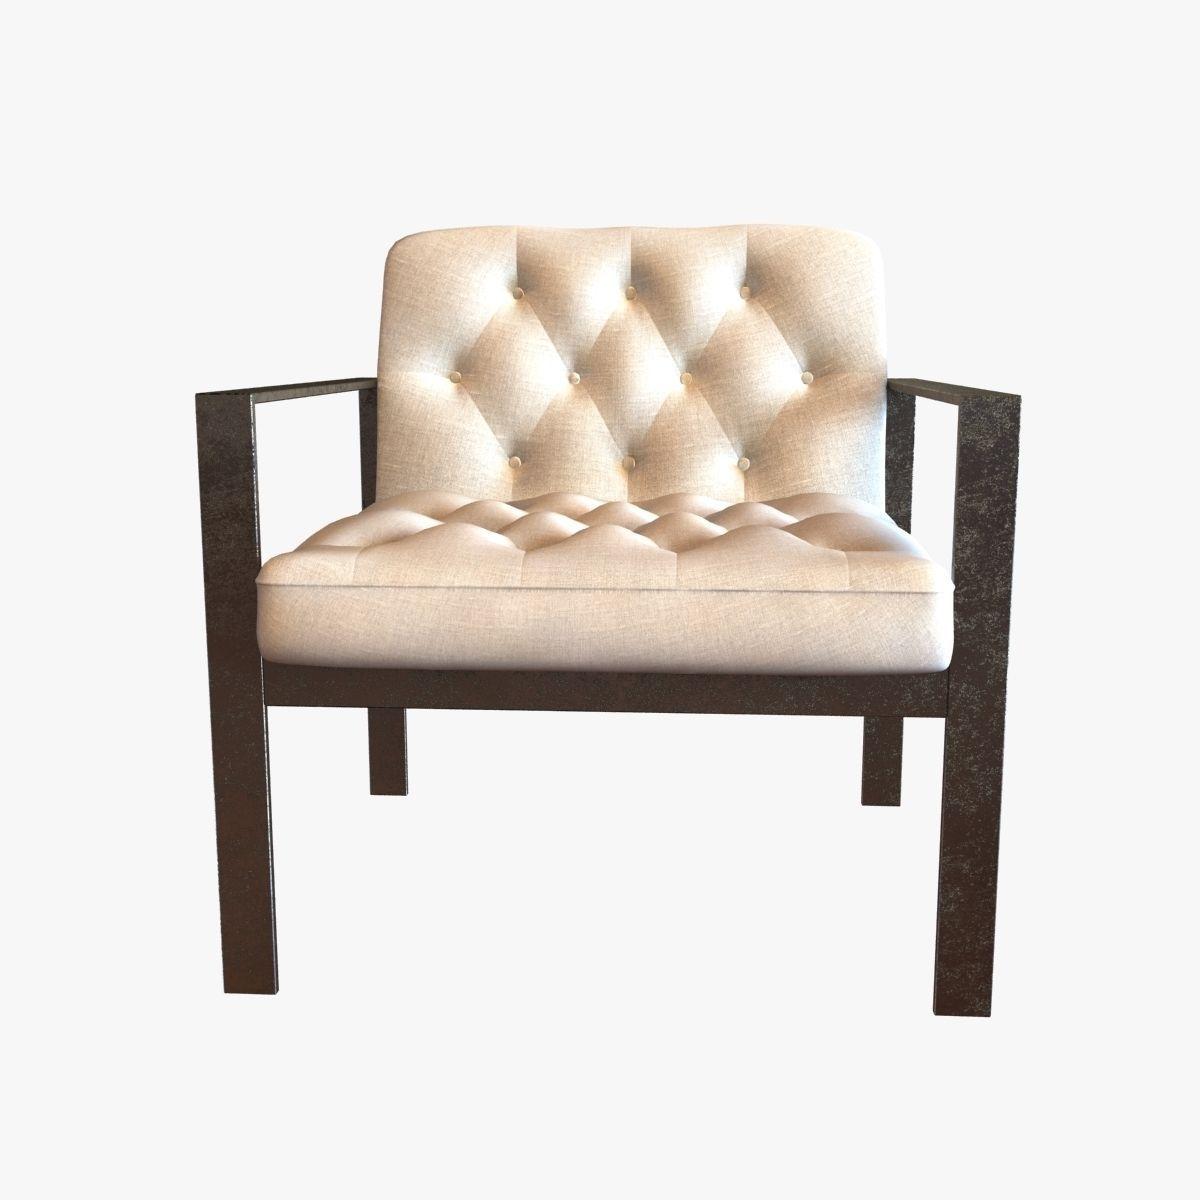 noir furniture chairs santa chair covers bed bath and beyond marx 3d model max obj 3ds fbx